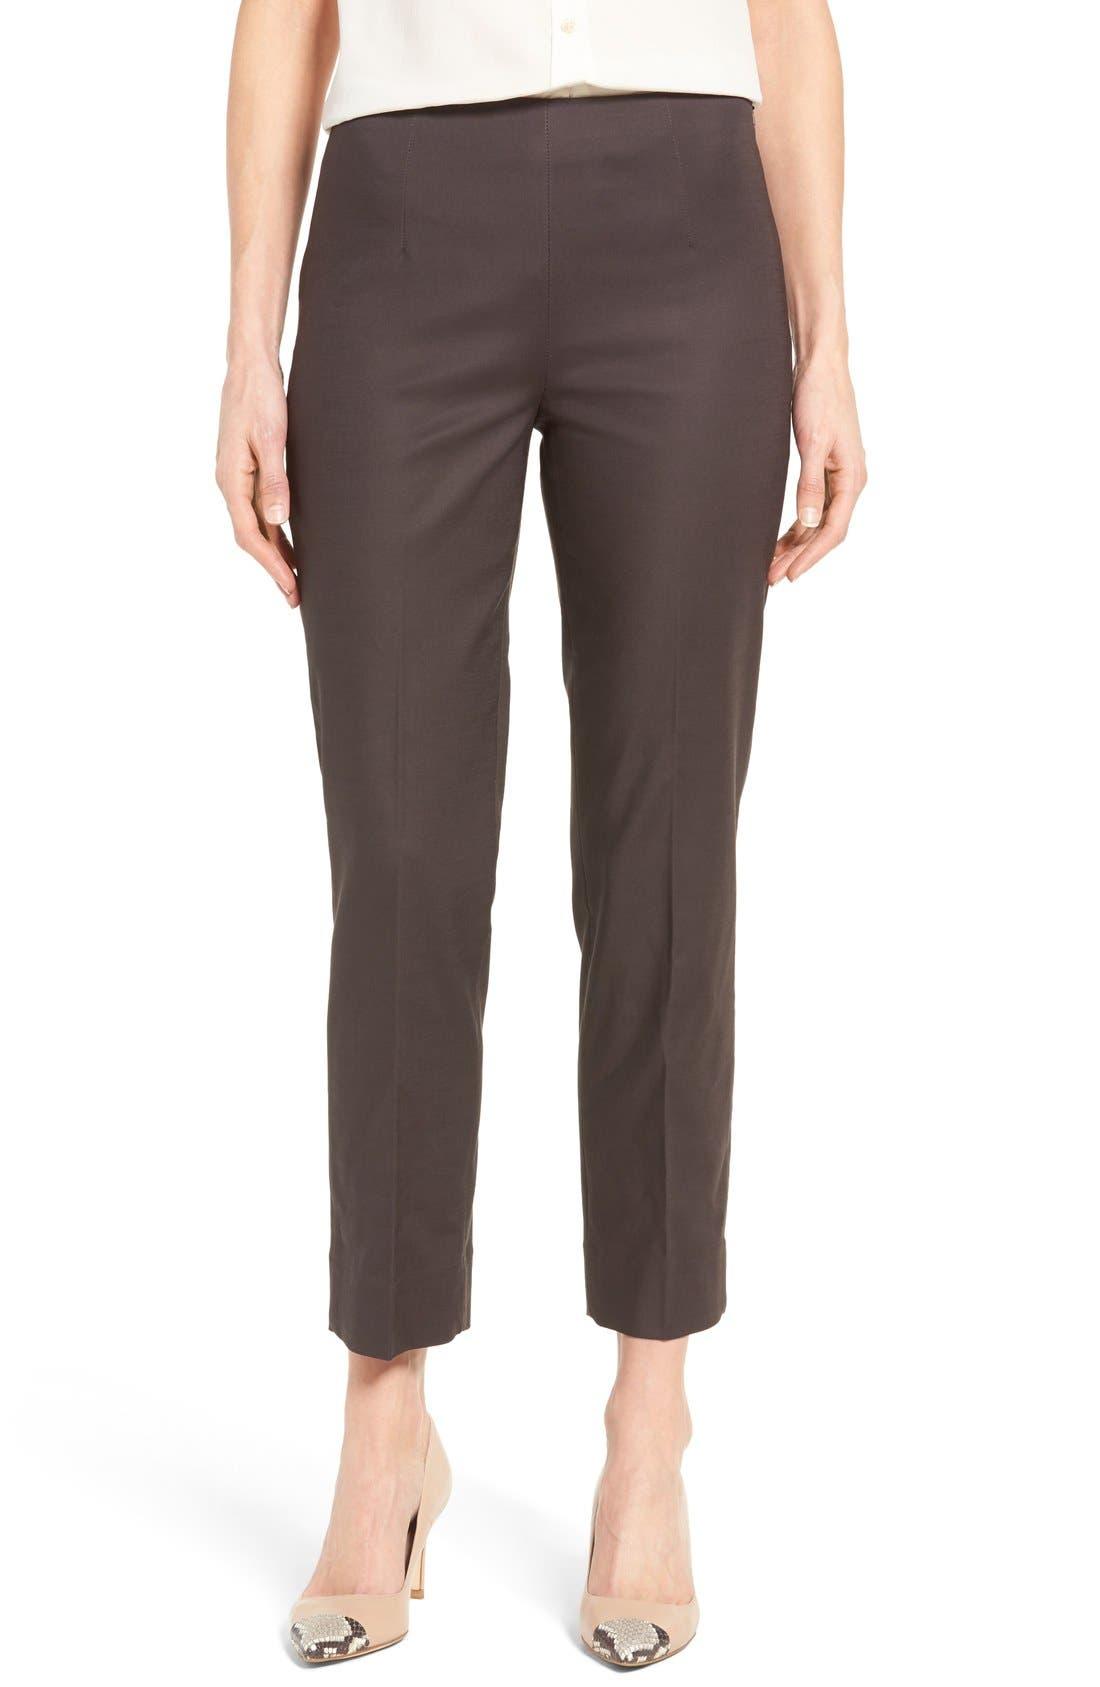 NIC+ZOE 'Perfect' Side Zip Ankle Pants